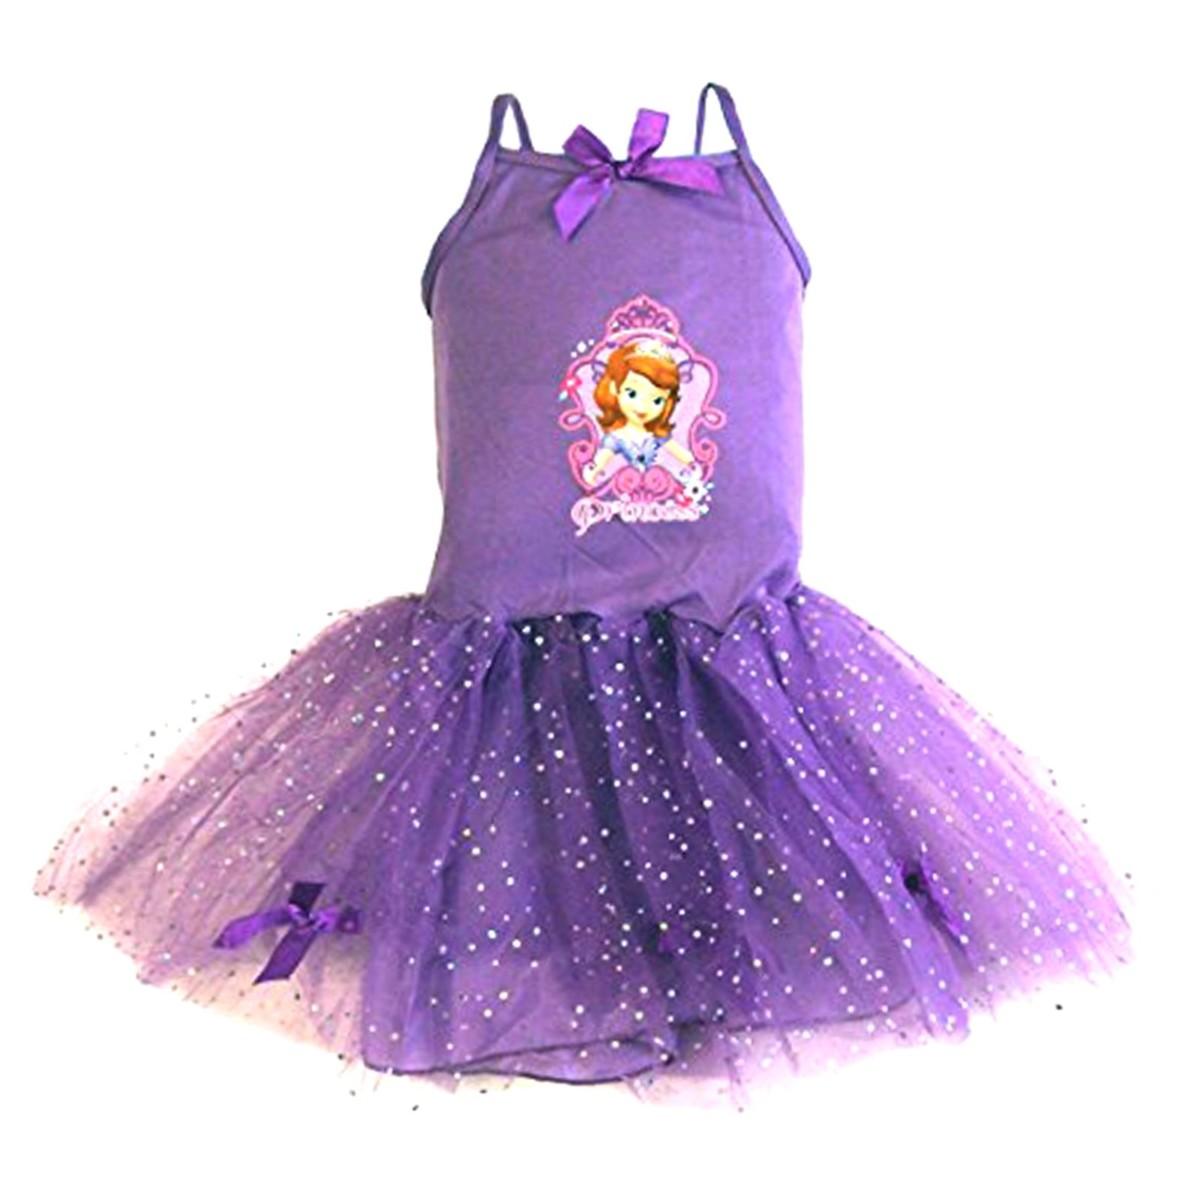 Princesse sofia le premier peppa pig disney dress up fancy dress